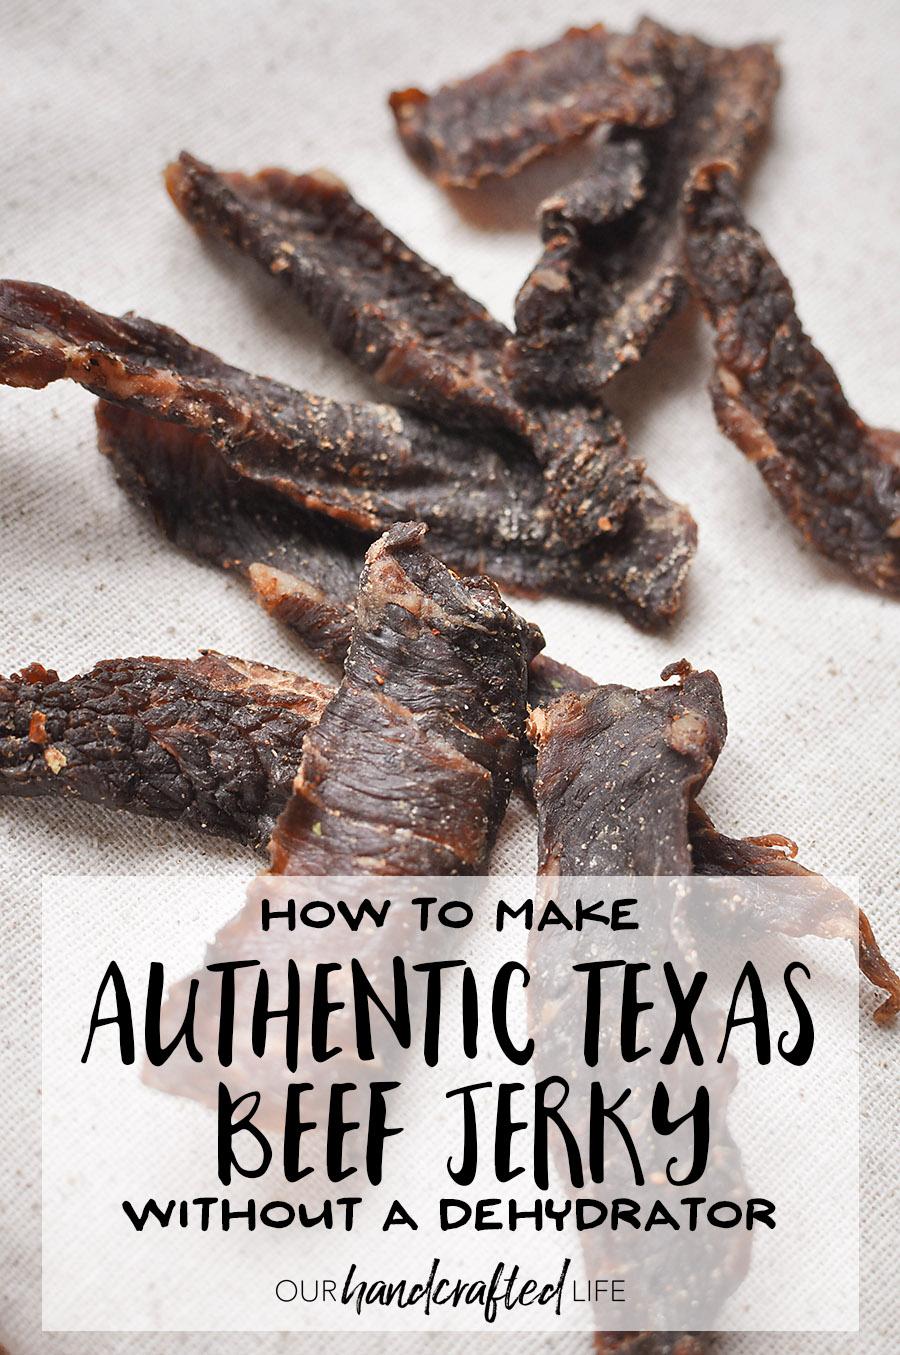 Authentic Texas Beef Jerky